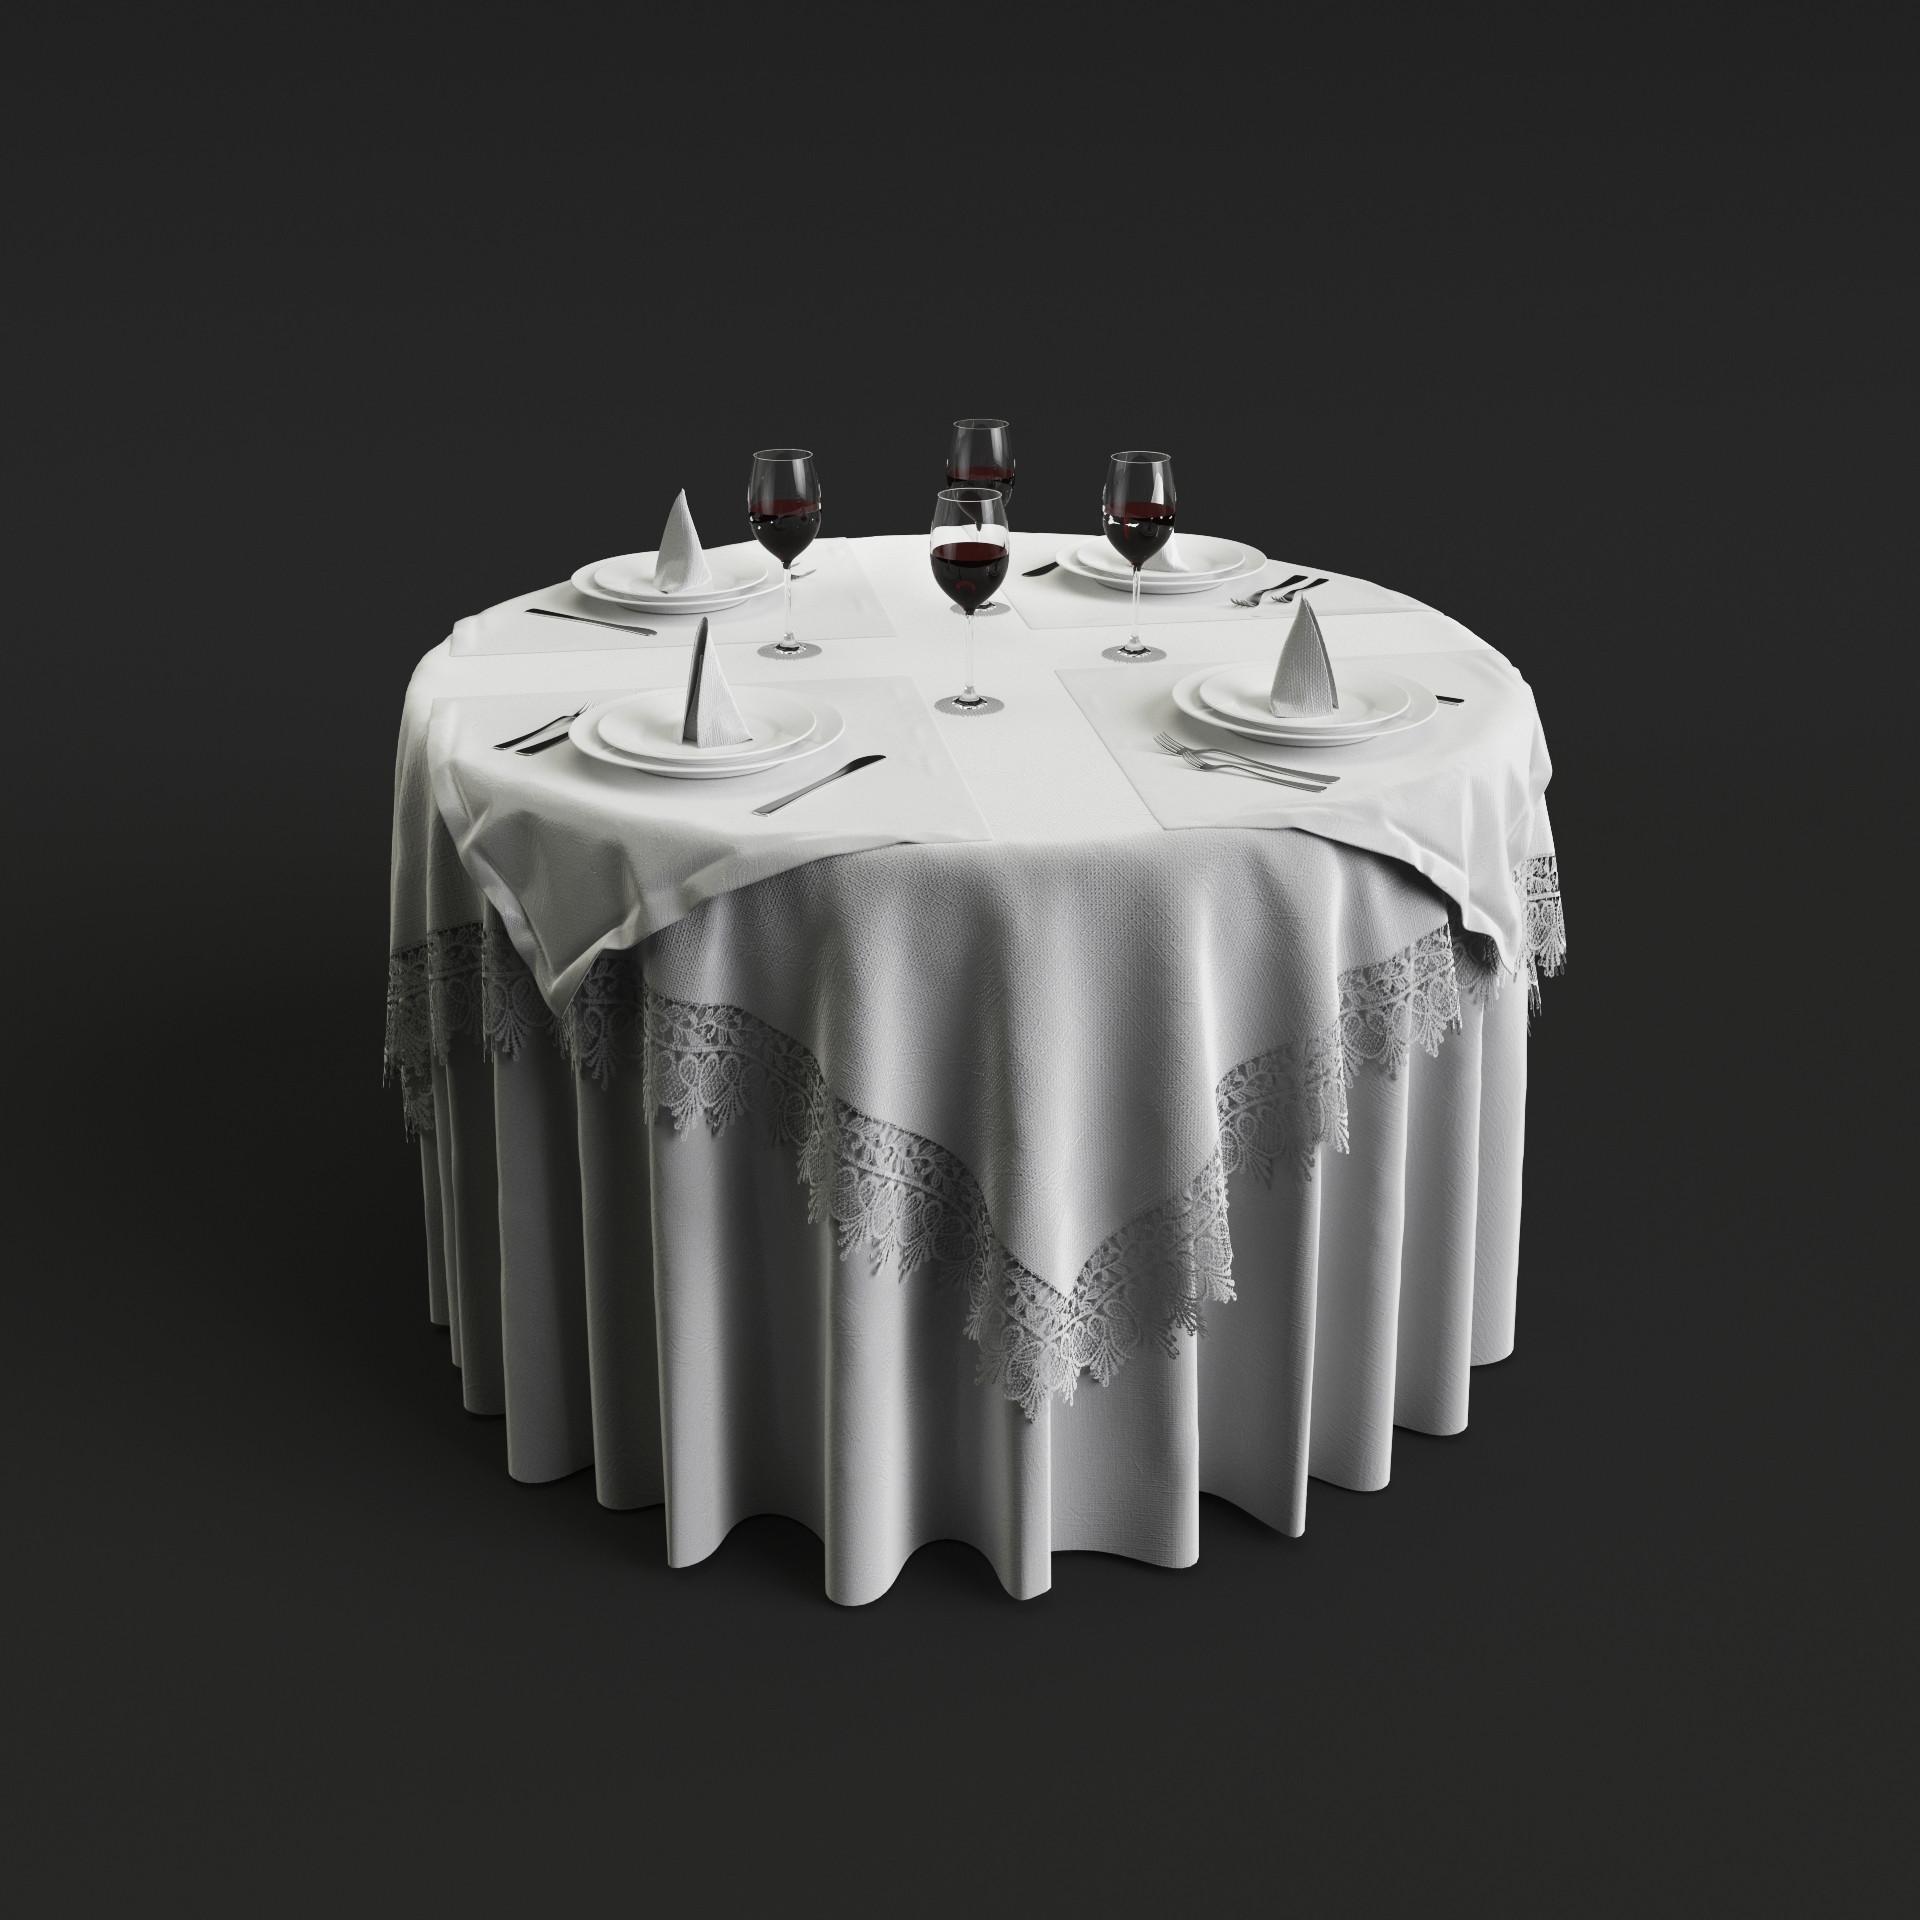 Tablecloth1_Post.jpg